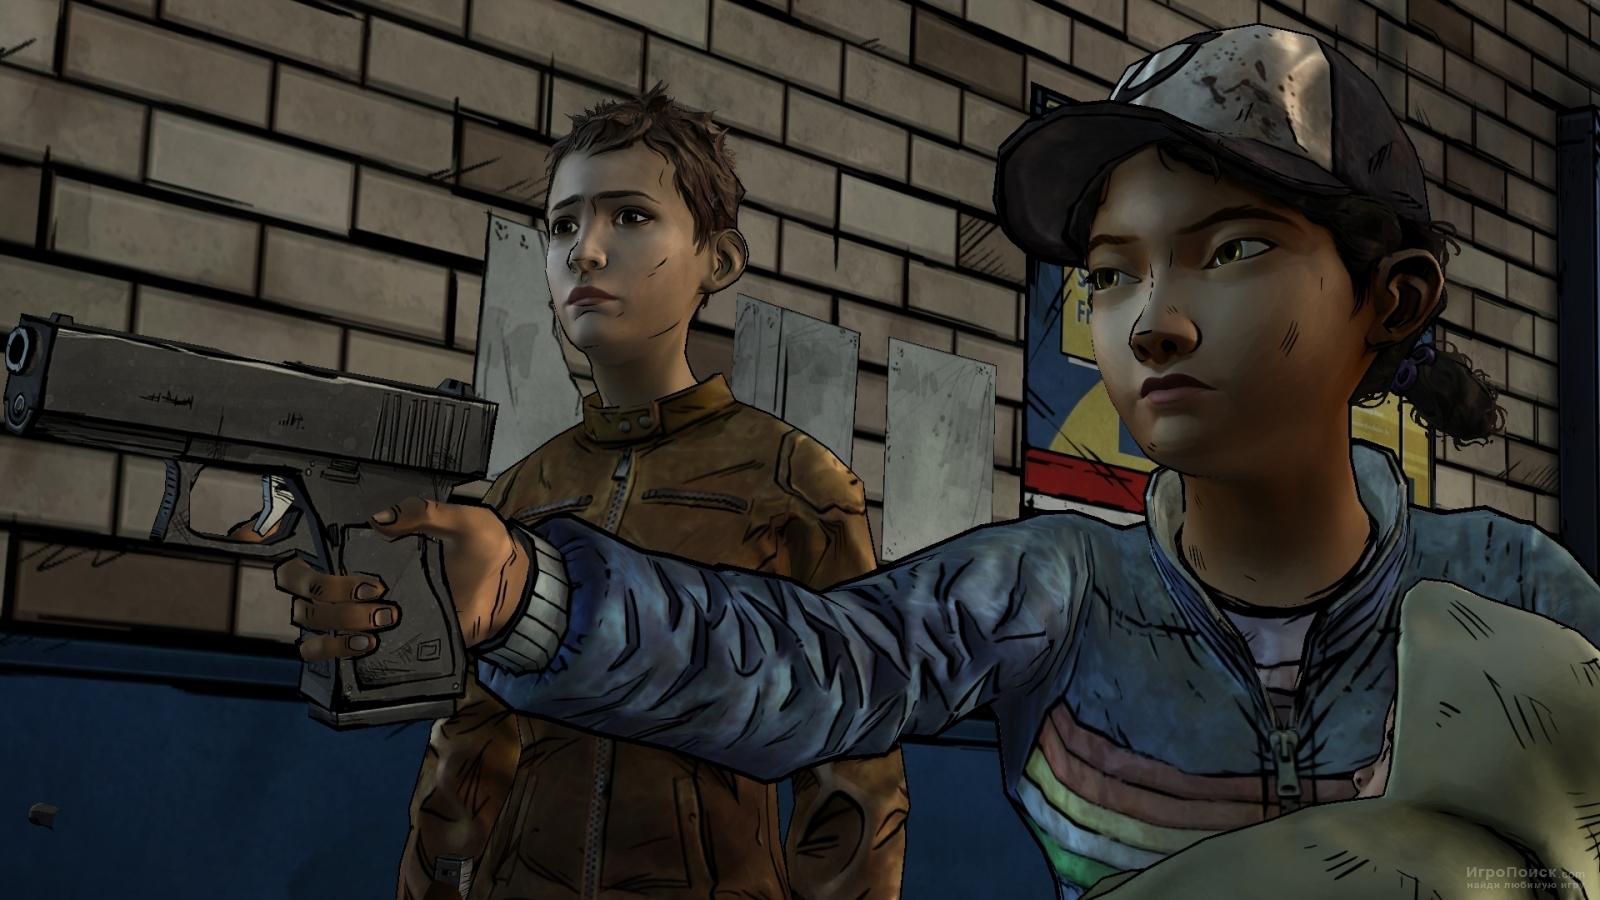 Скриншот к игре The Walking Dead: Season Two - Episode 5: No Going Back